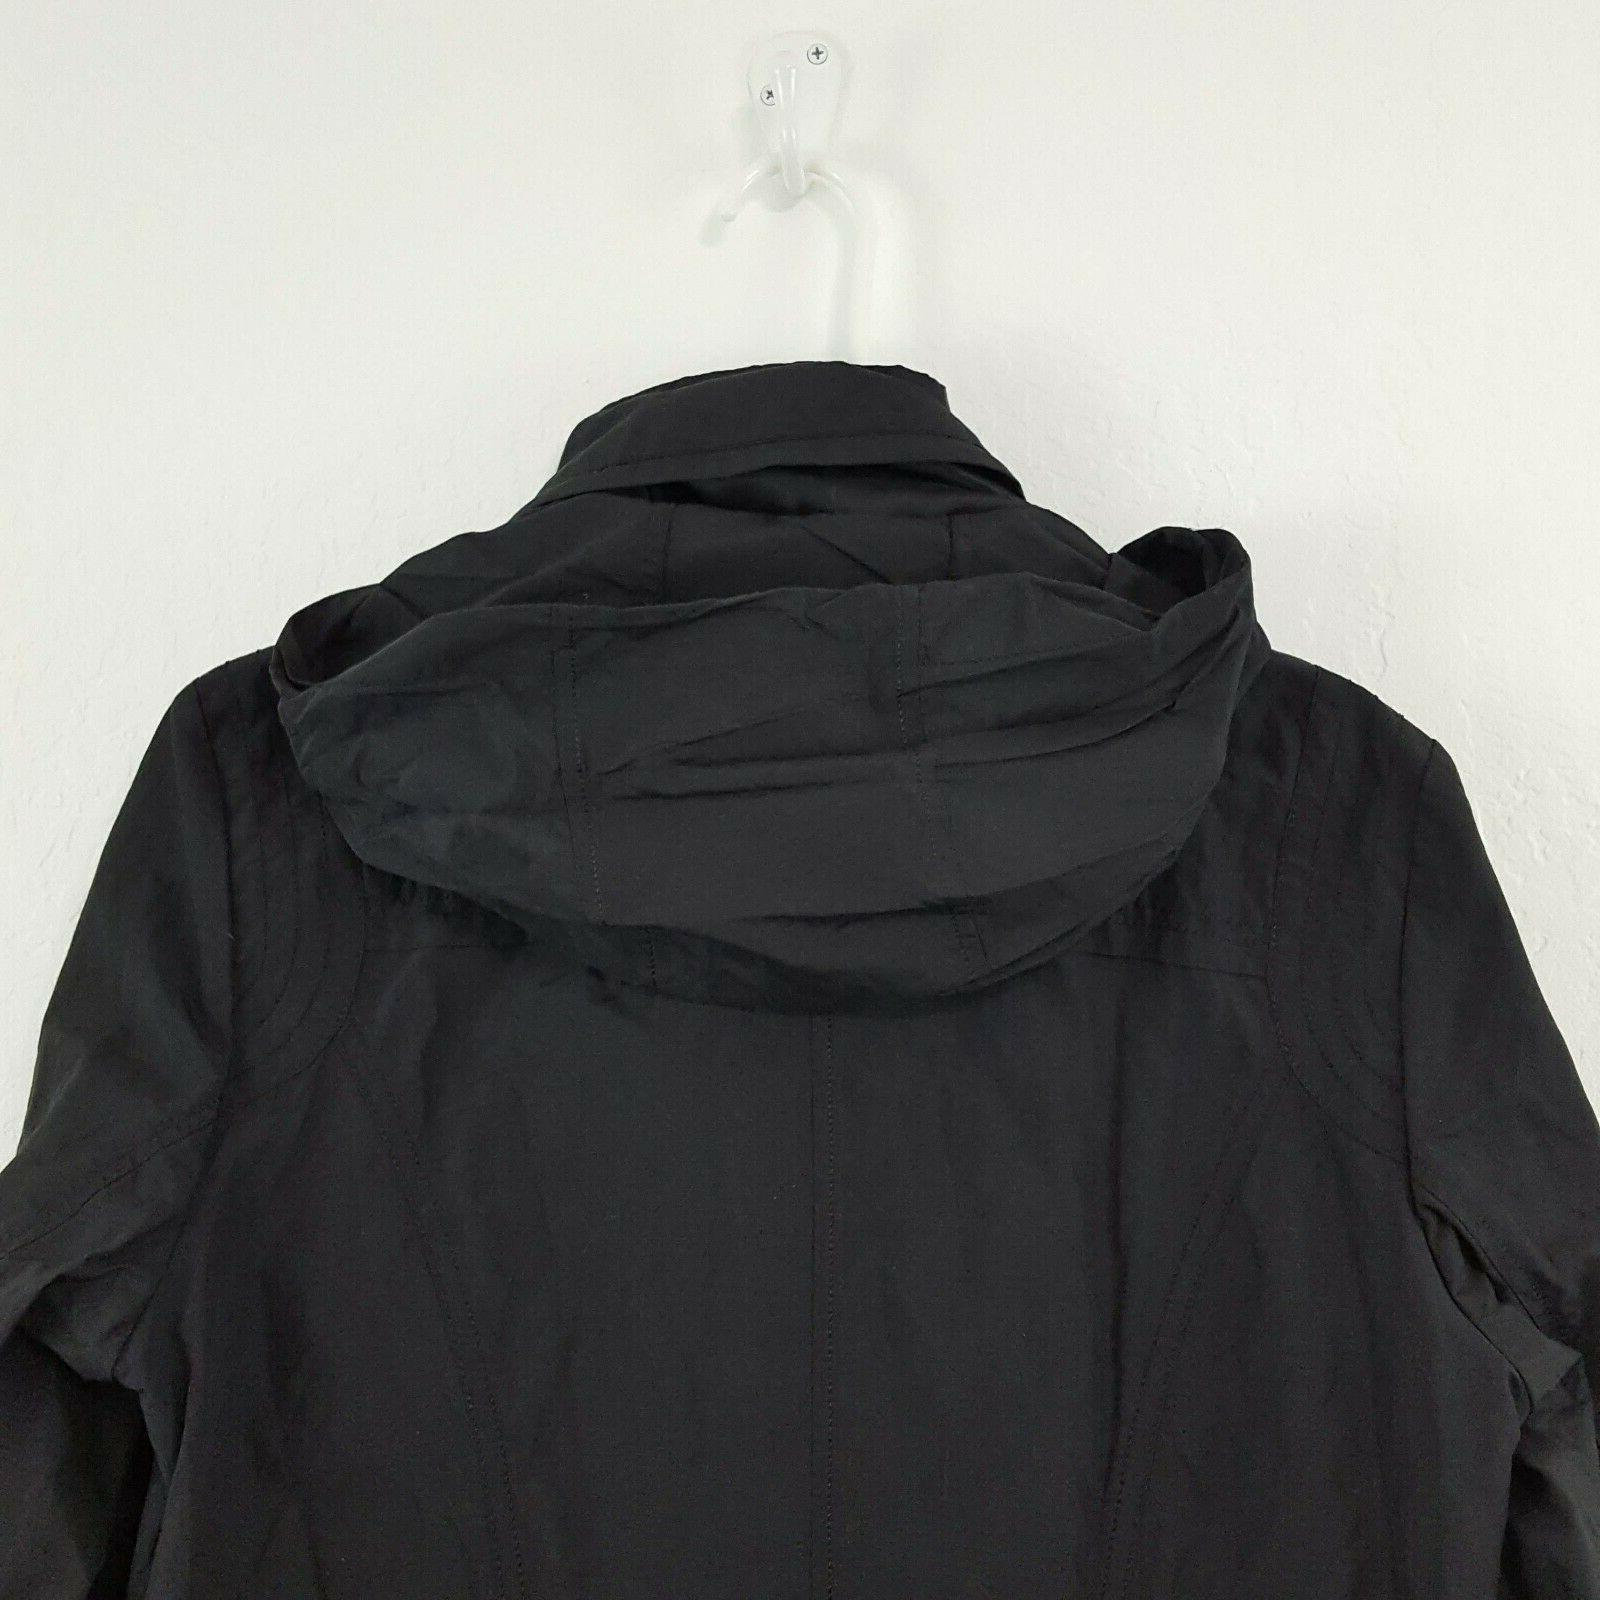 NWT Haan Black Hooded Raincoat Jacket Size Large Zip